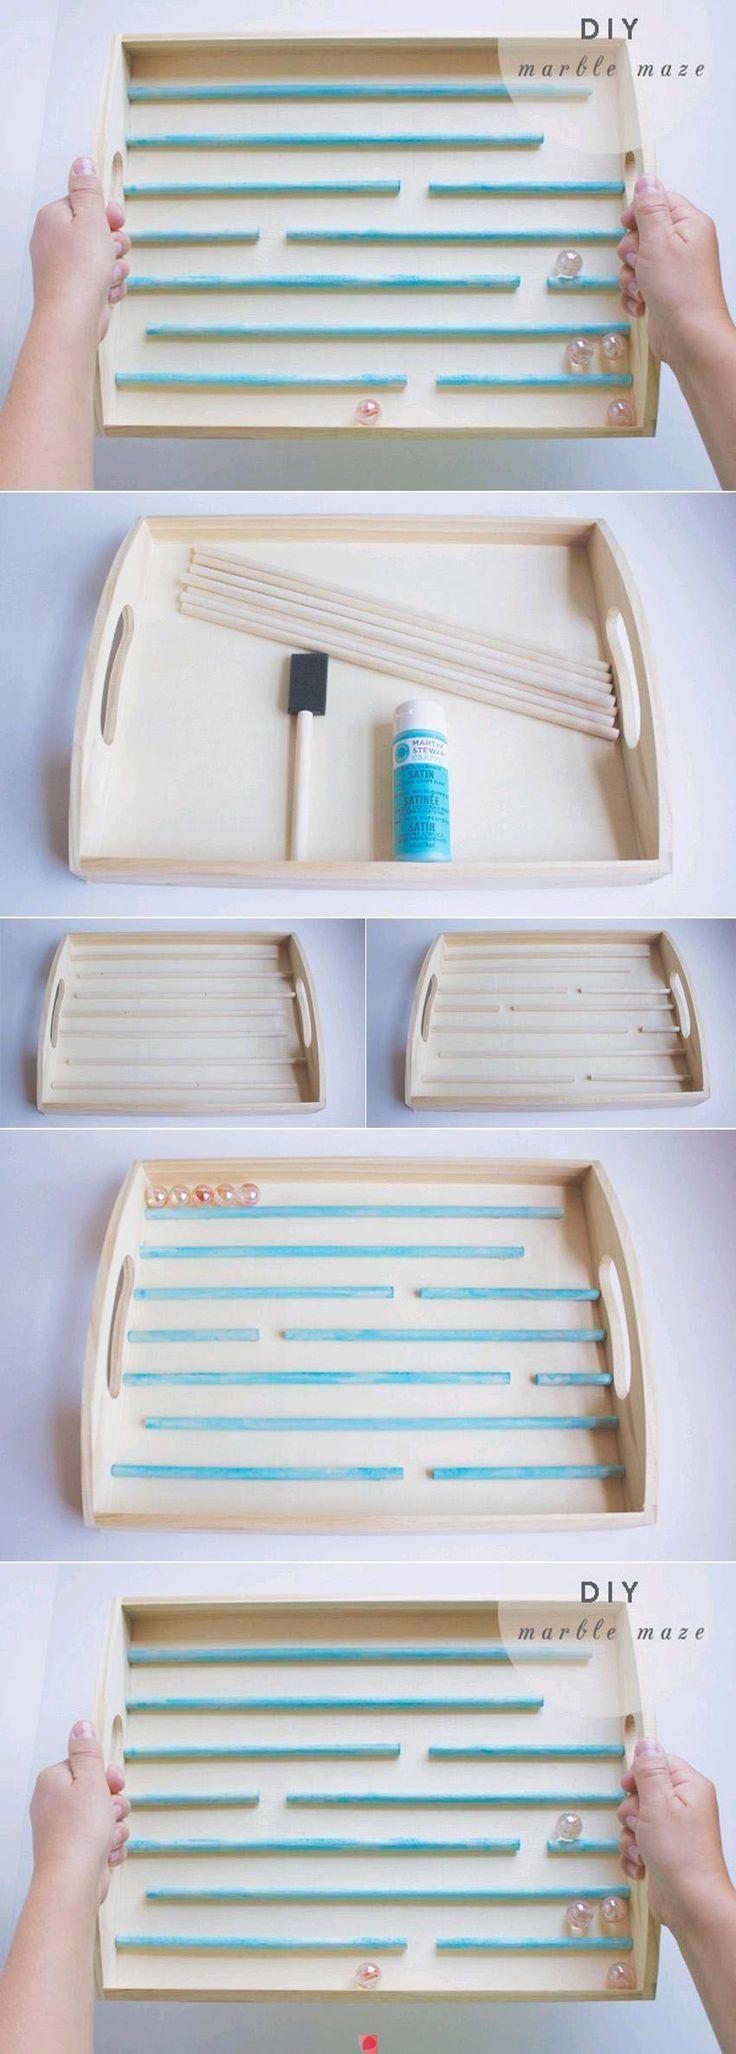 straw maze repined by http://RecyclingOT.com